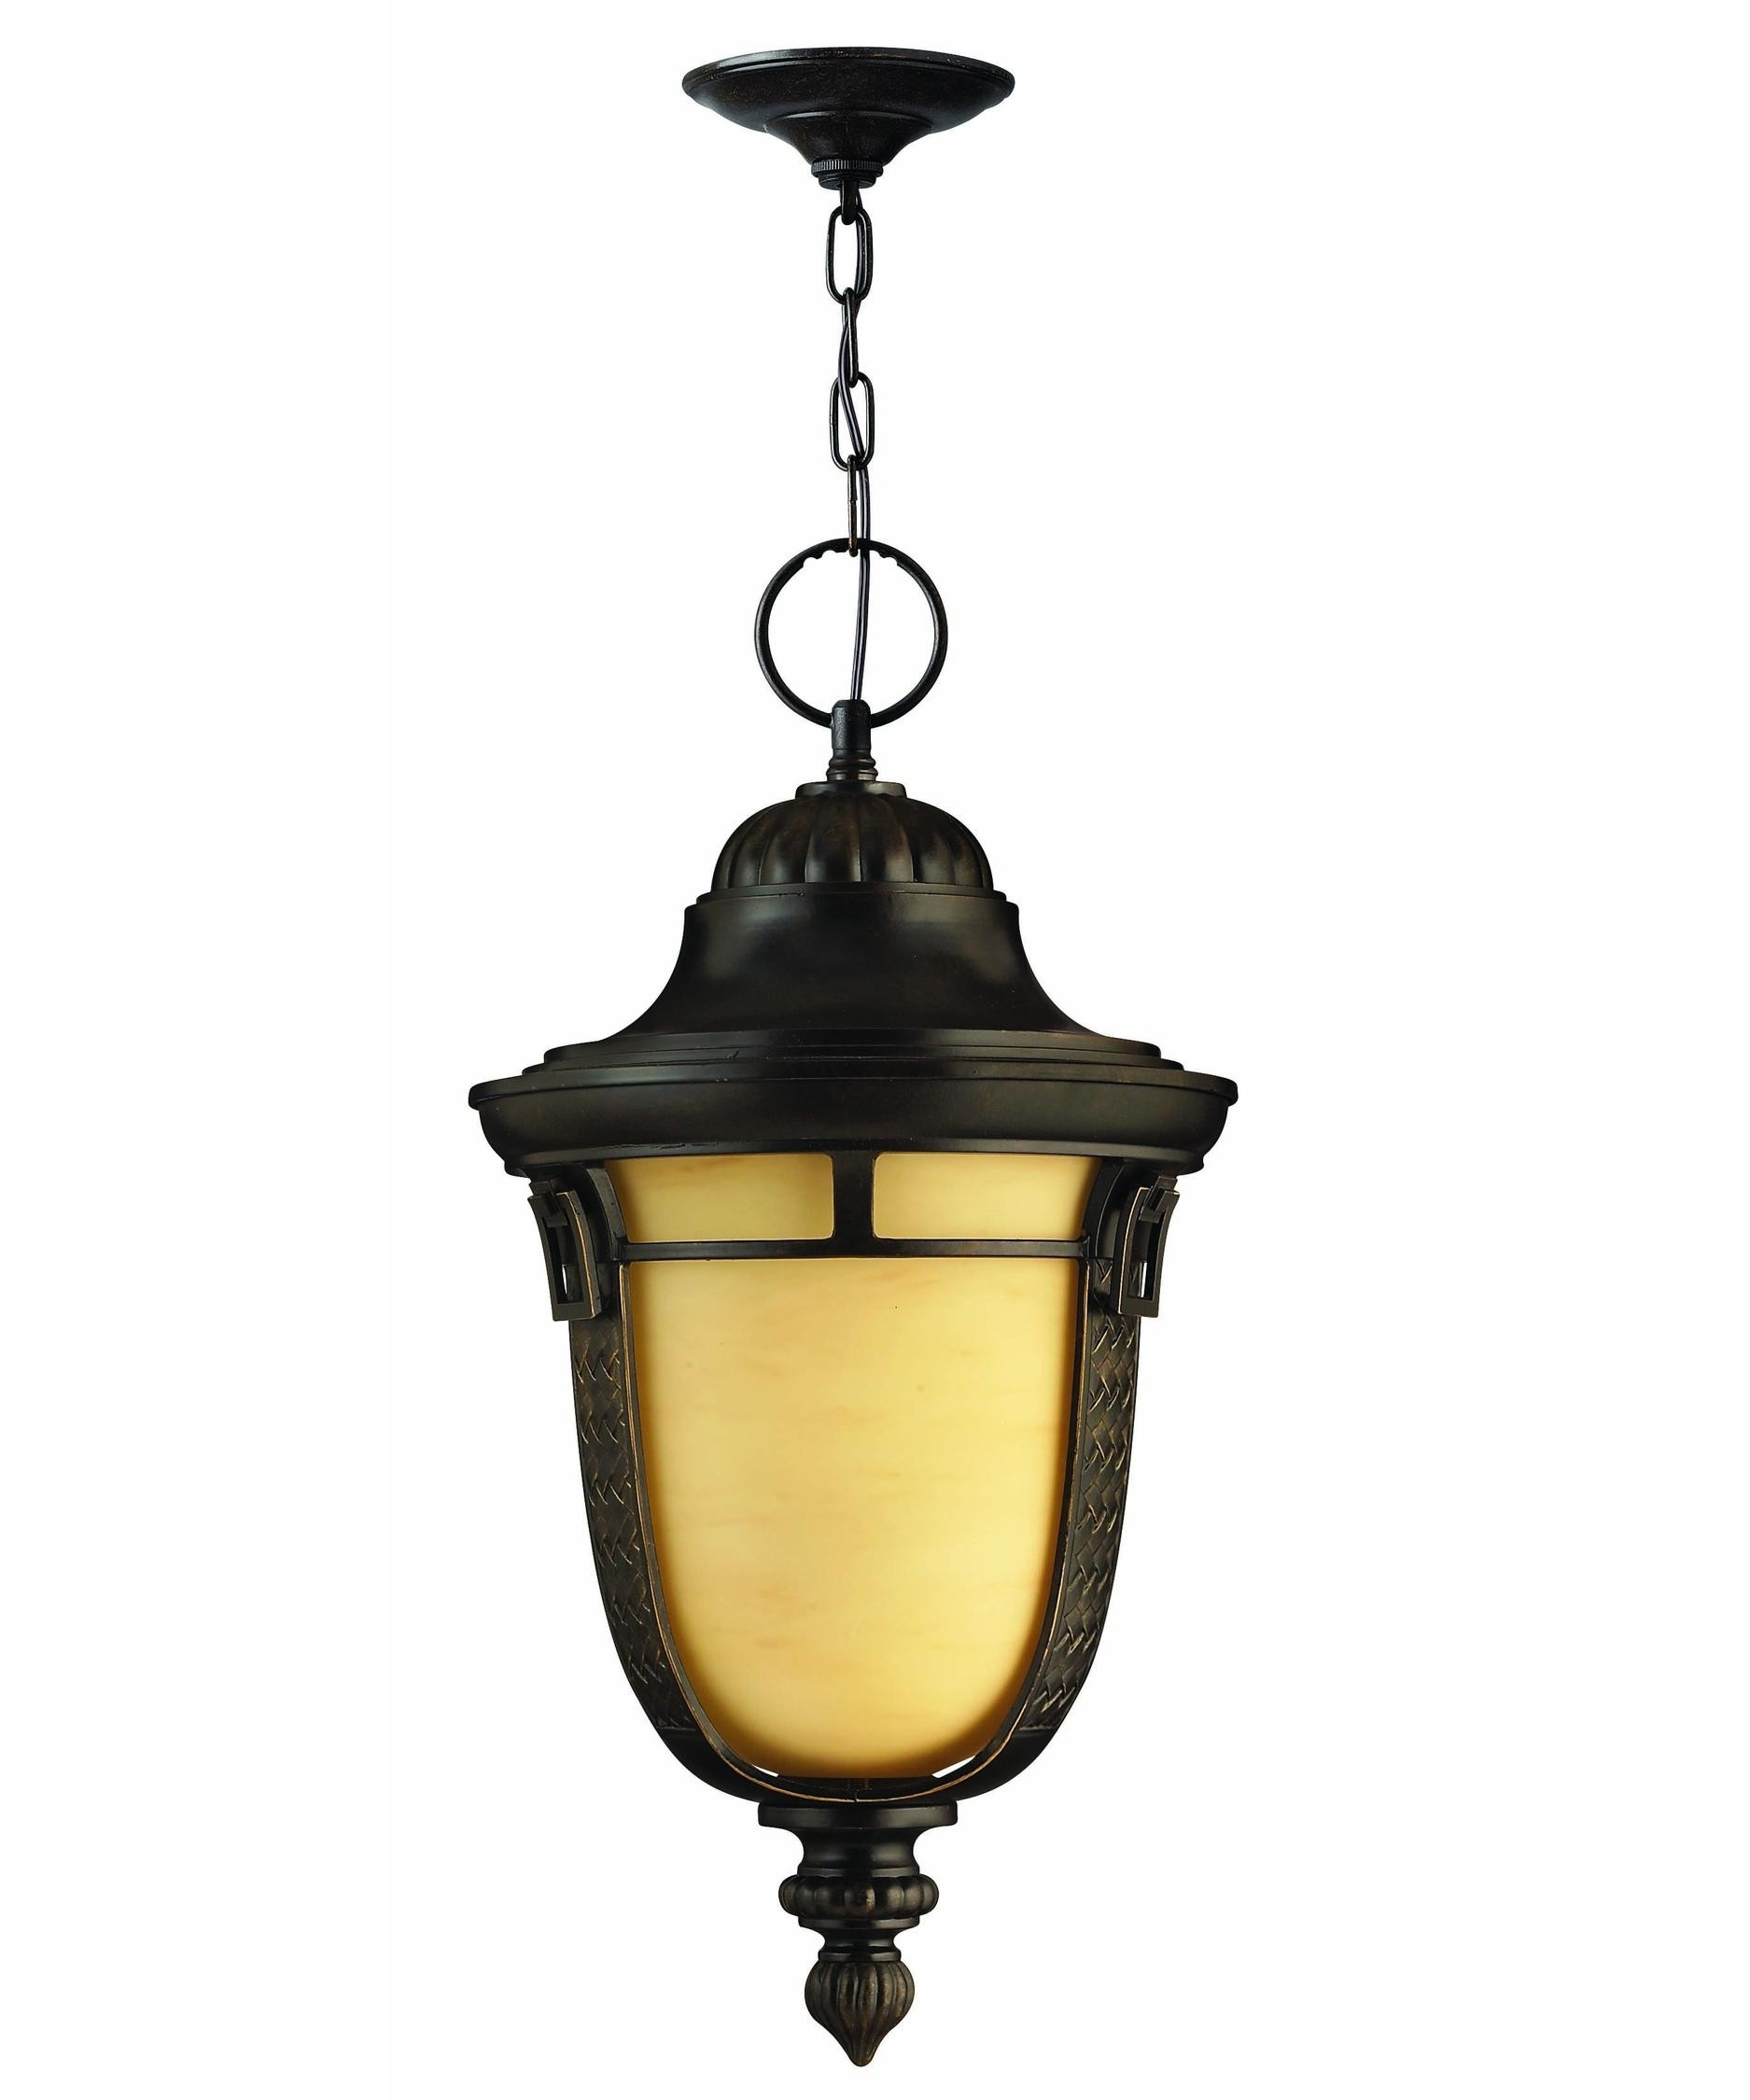 Outdoor String Lights Home Depot Inspirational Fixtures Light In Outdoor Hanging Barn Lights (View 8 of 15)